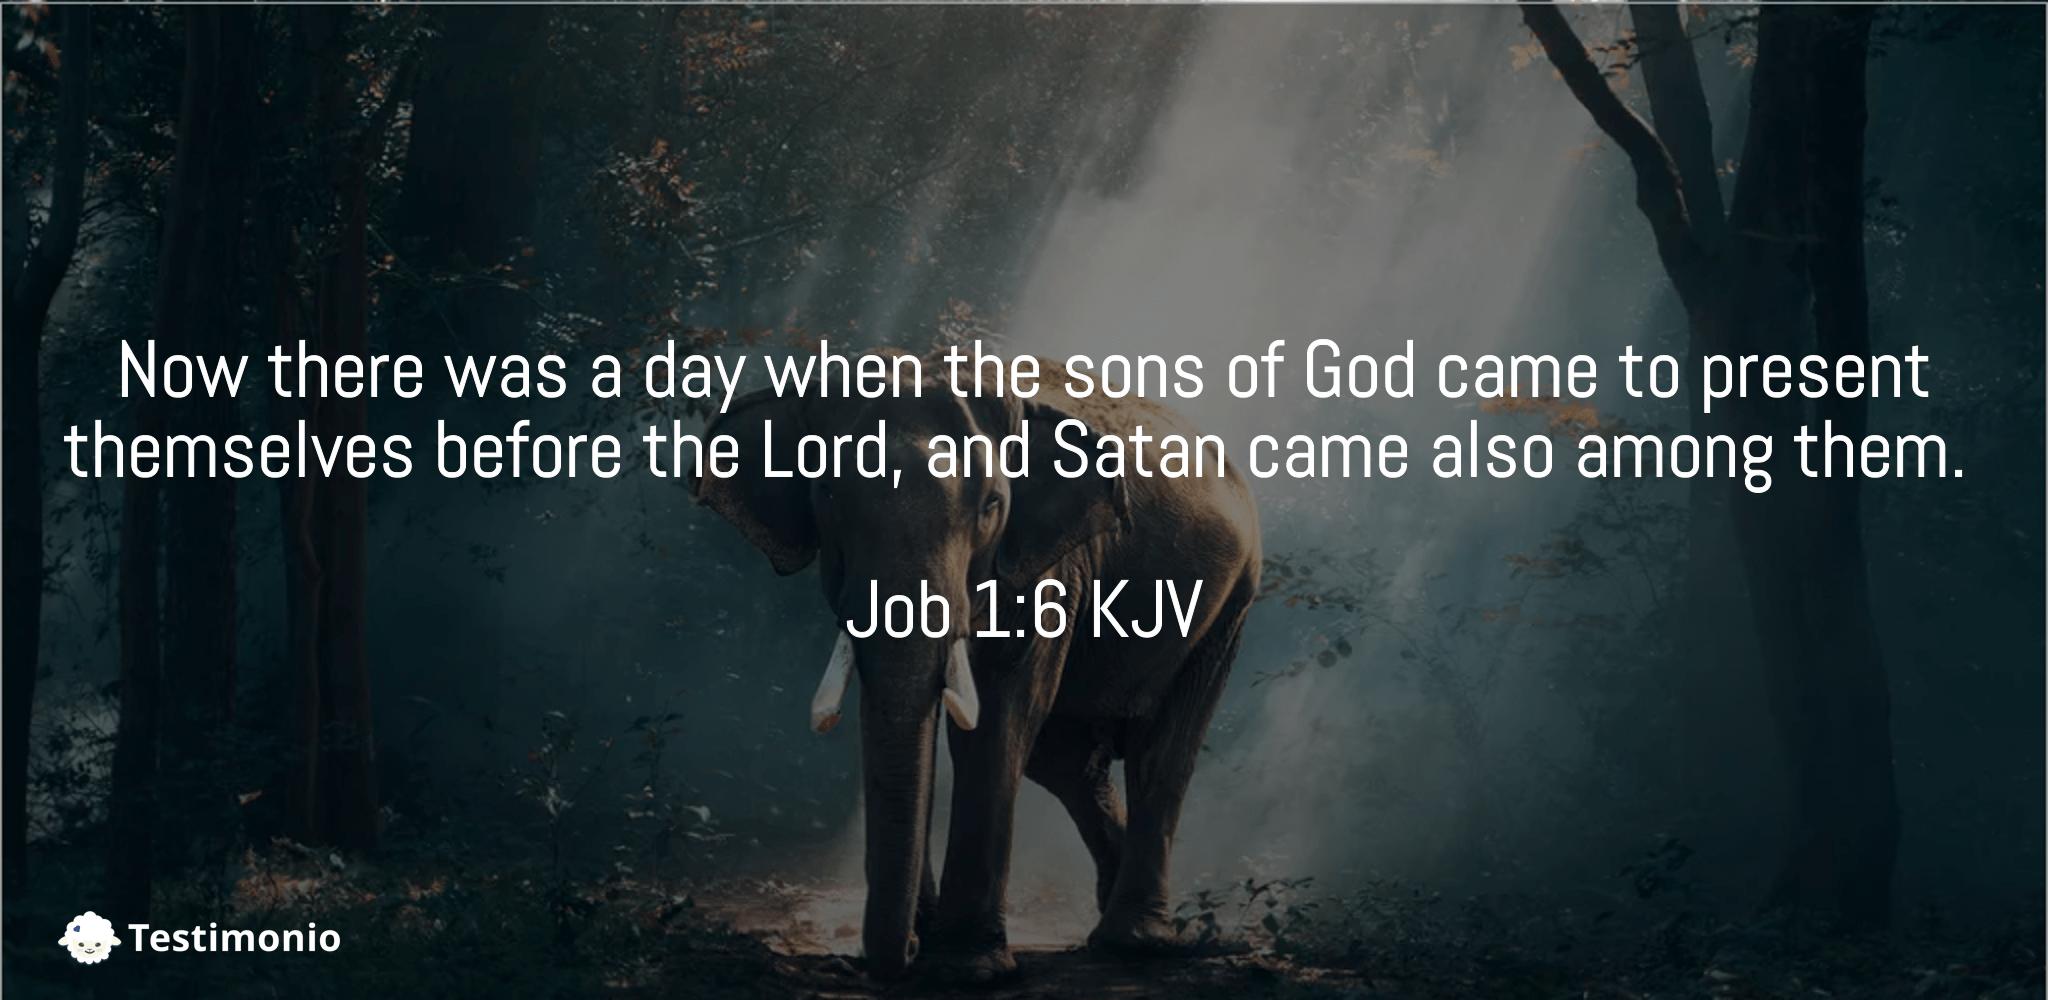 Job 1:6